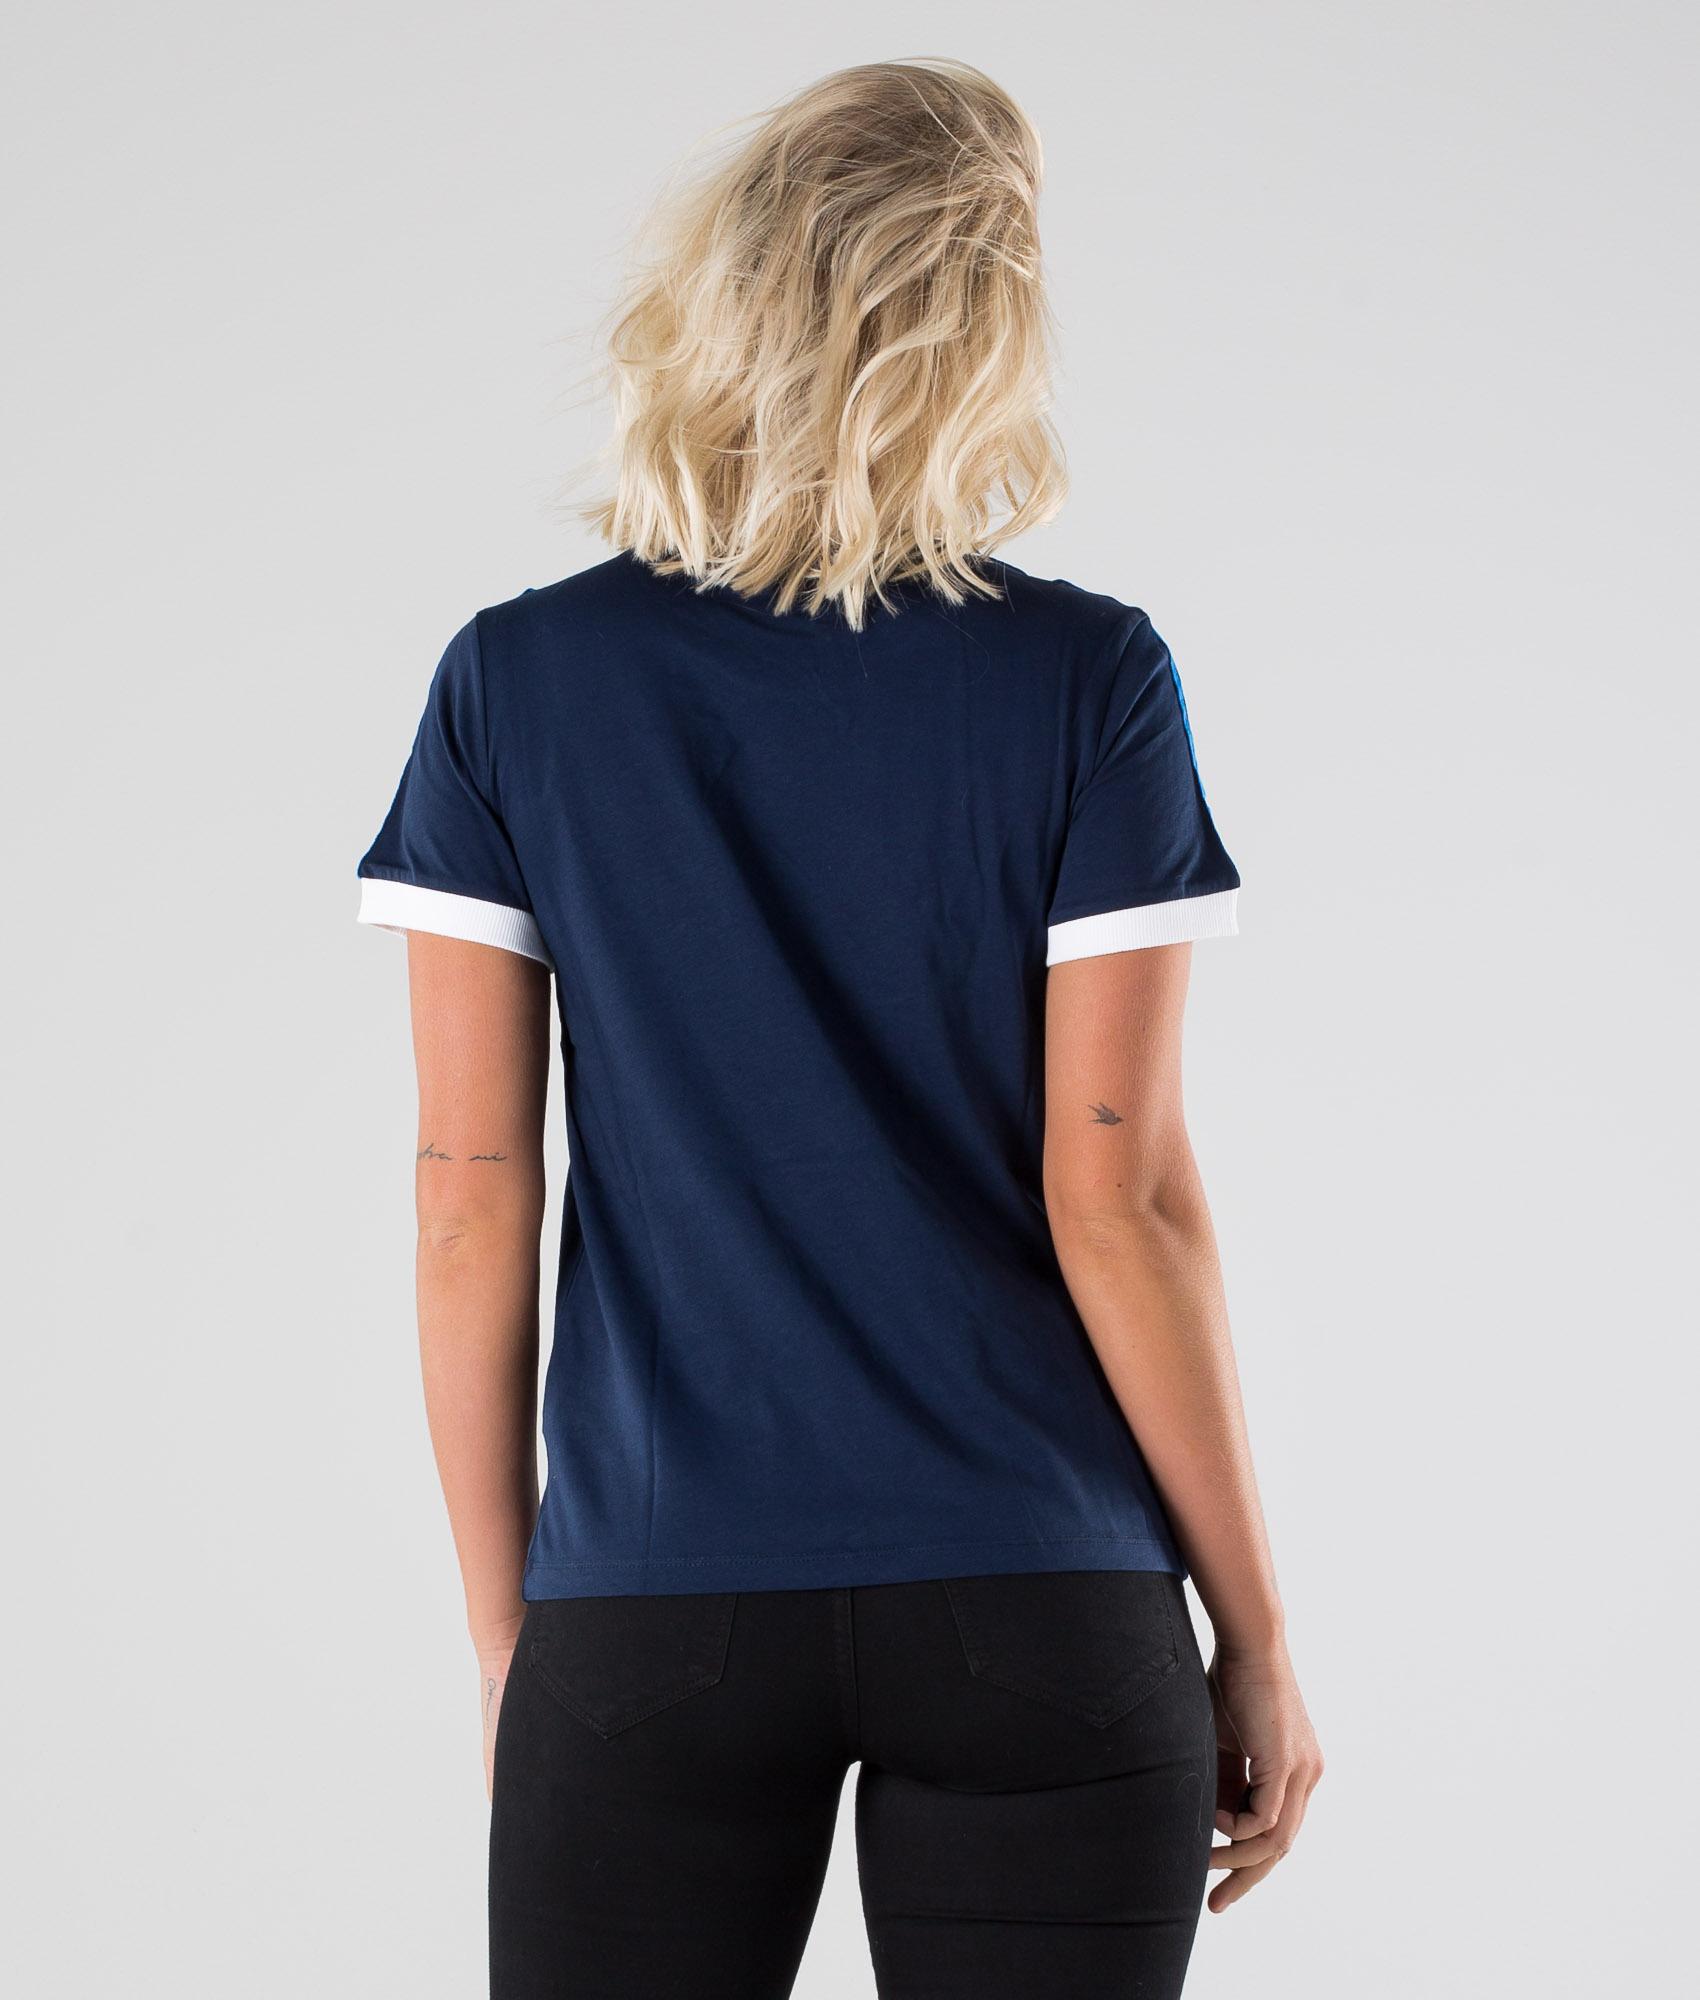 Adidas Originals 3 Stripes T Shirt Collegiate Navy